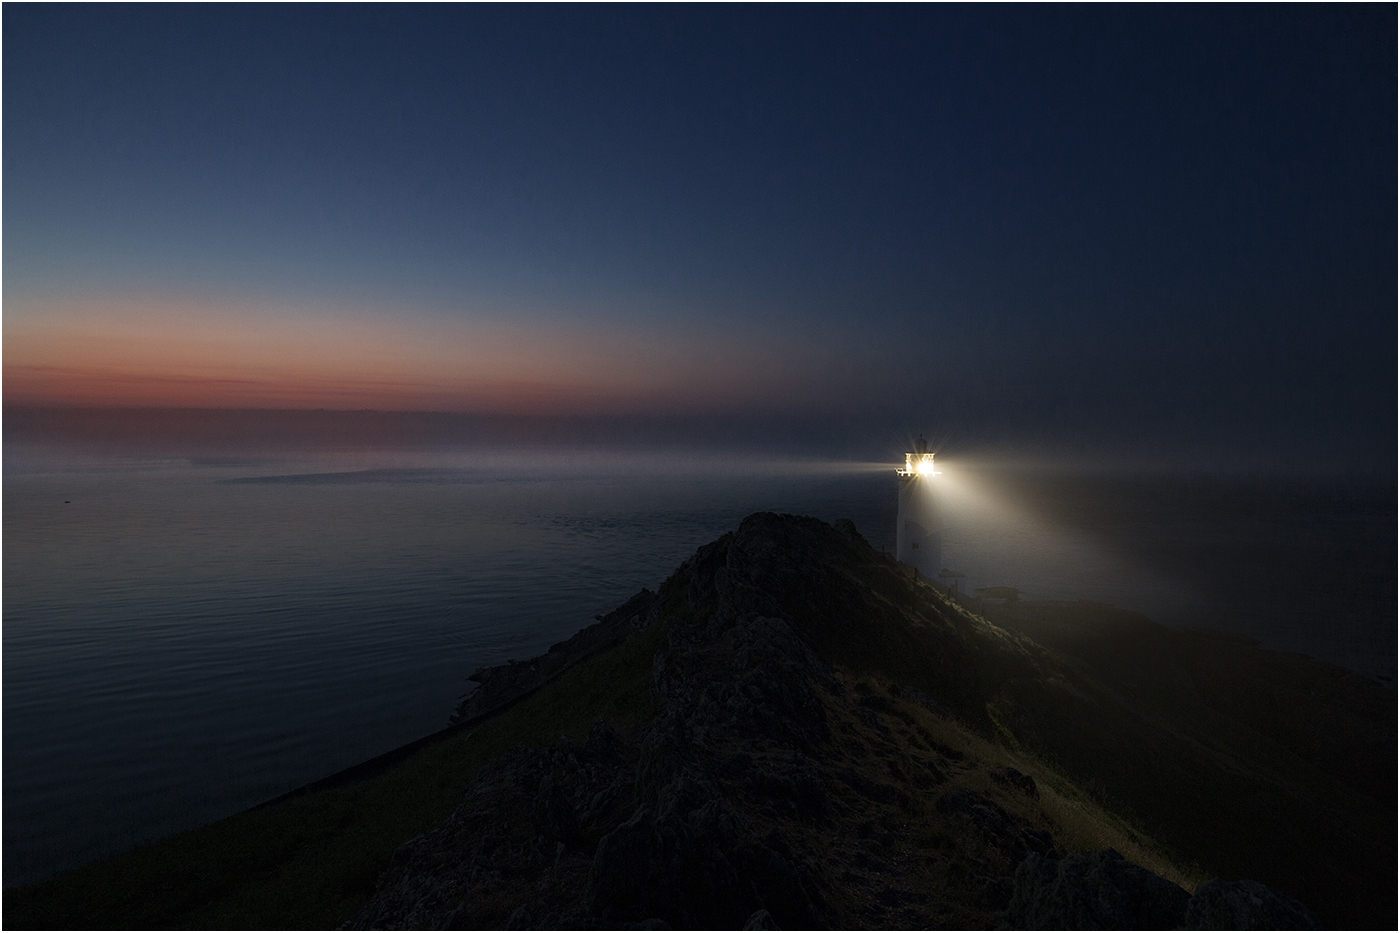 First 'Pre dawn at Start Point' by John Barton